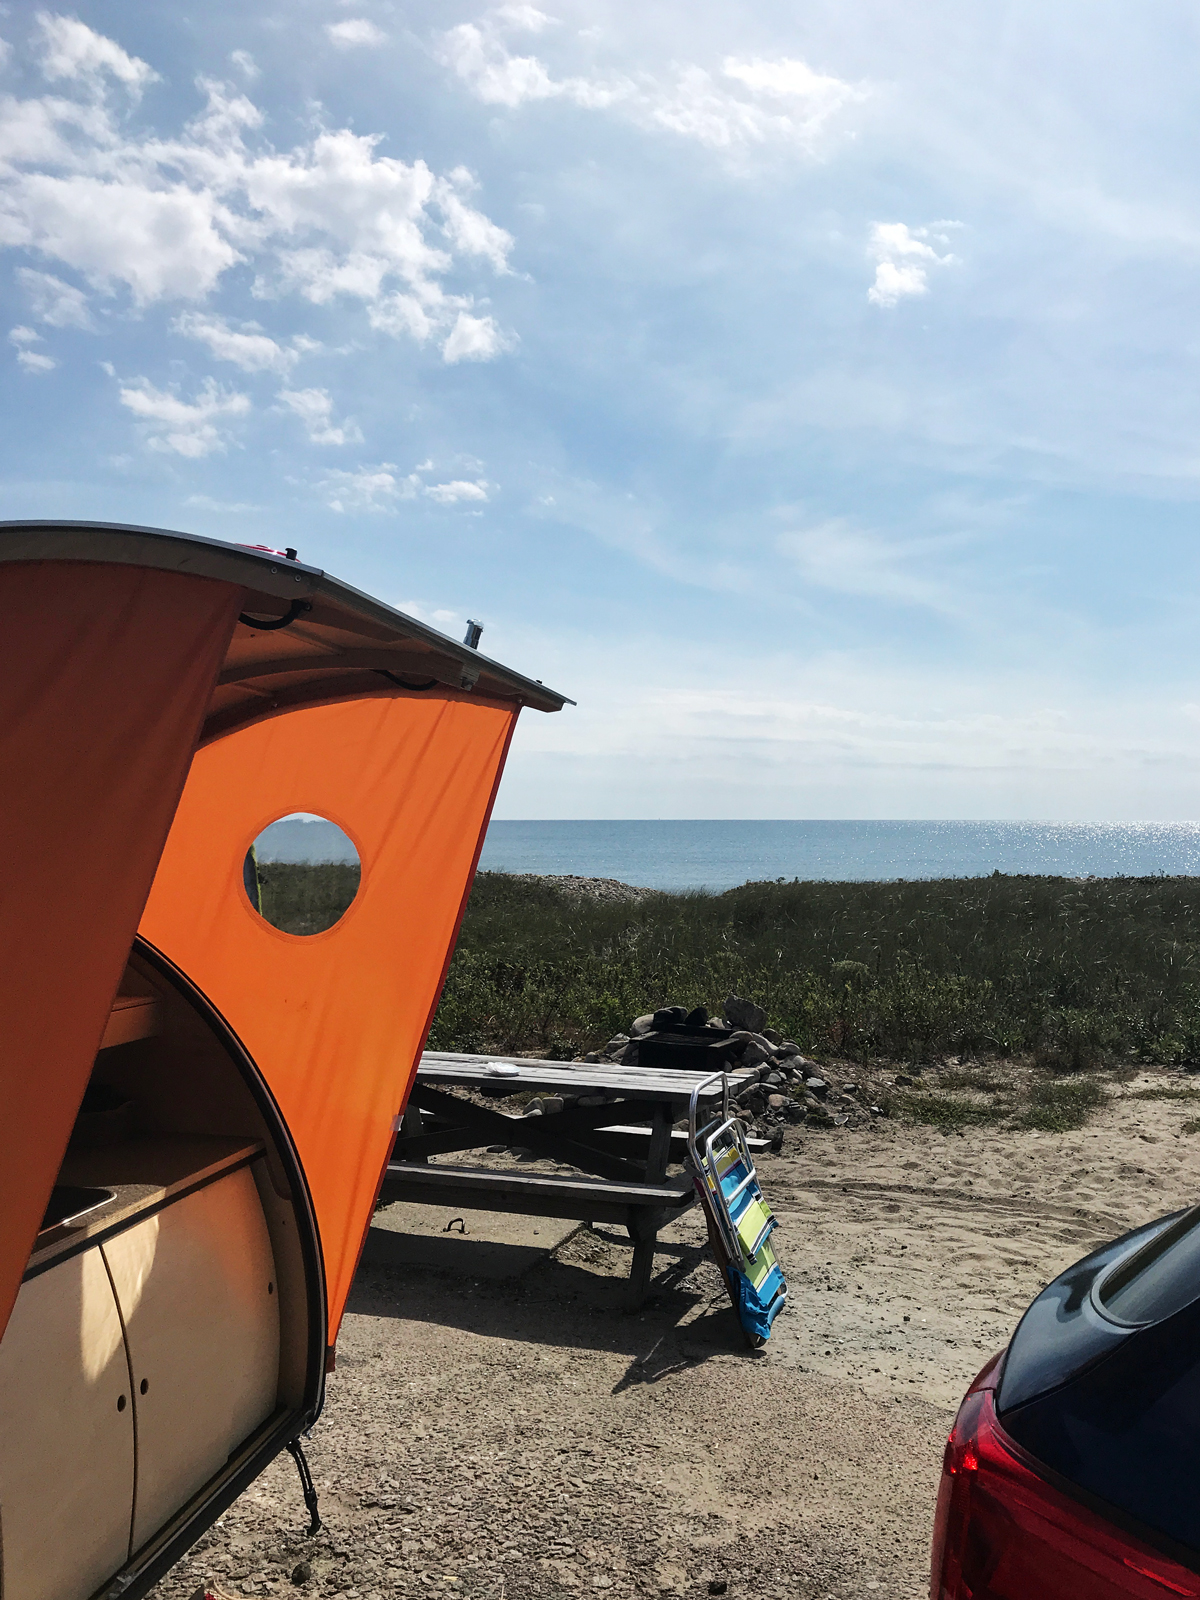 Camp on thebeach